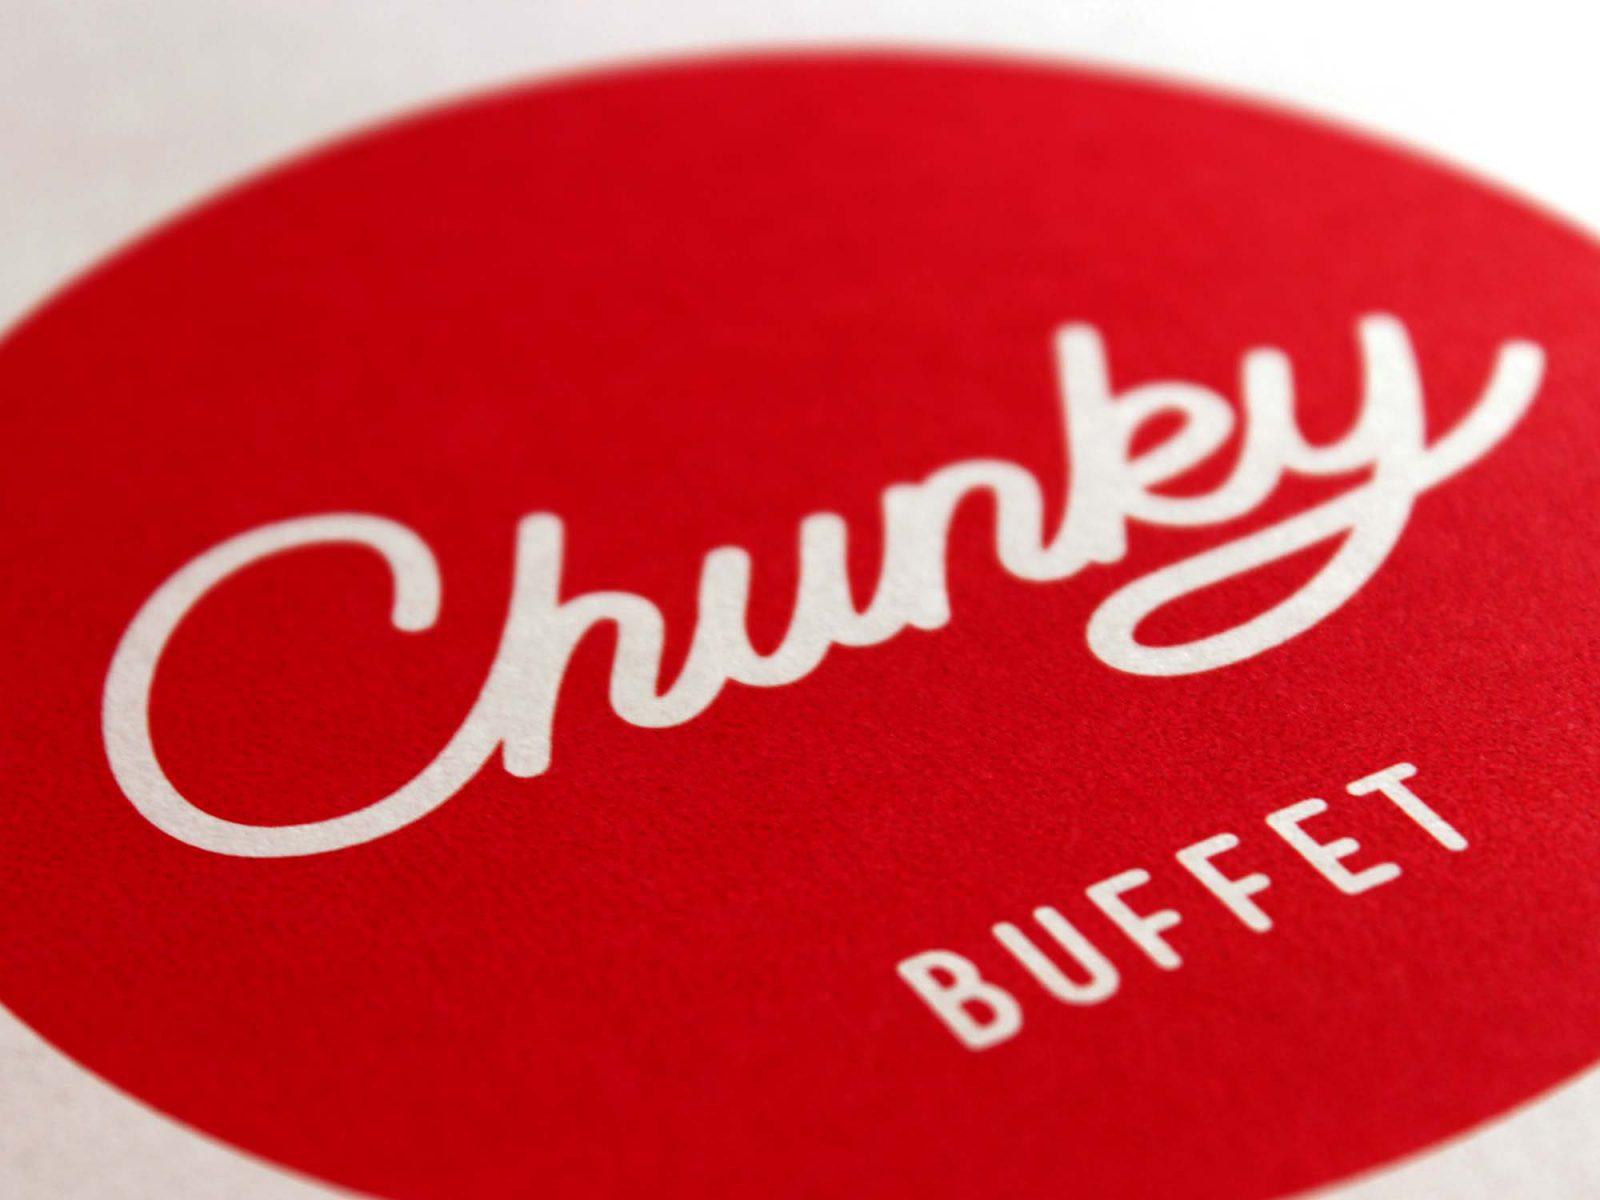 Chunky-Buffet-logo_0003_Layer 14